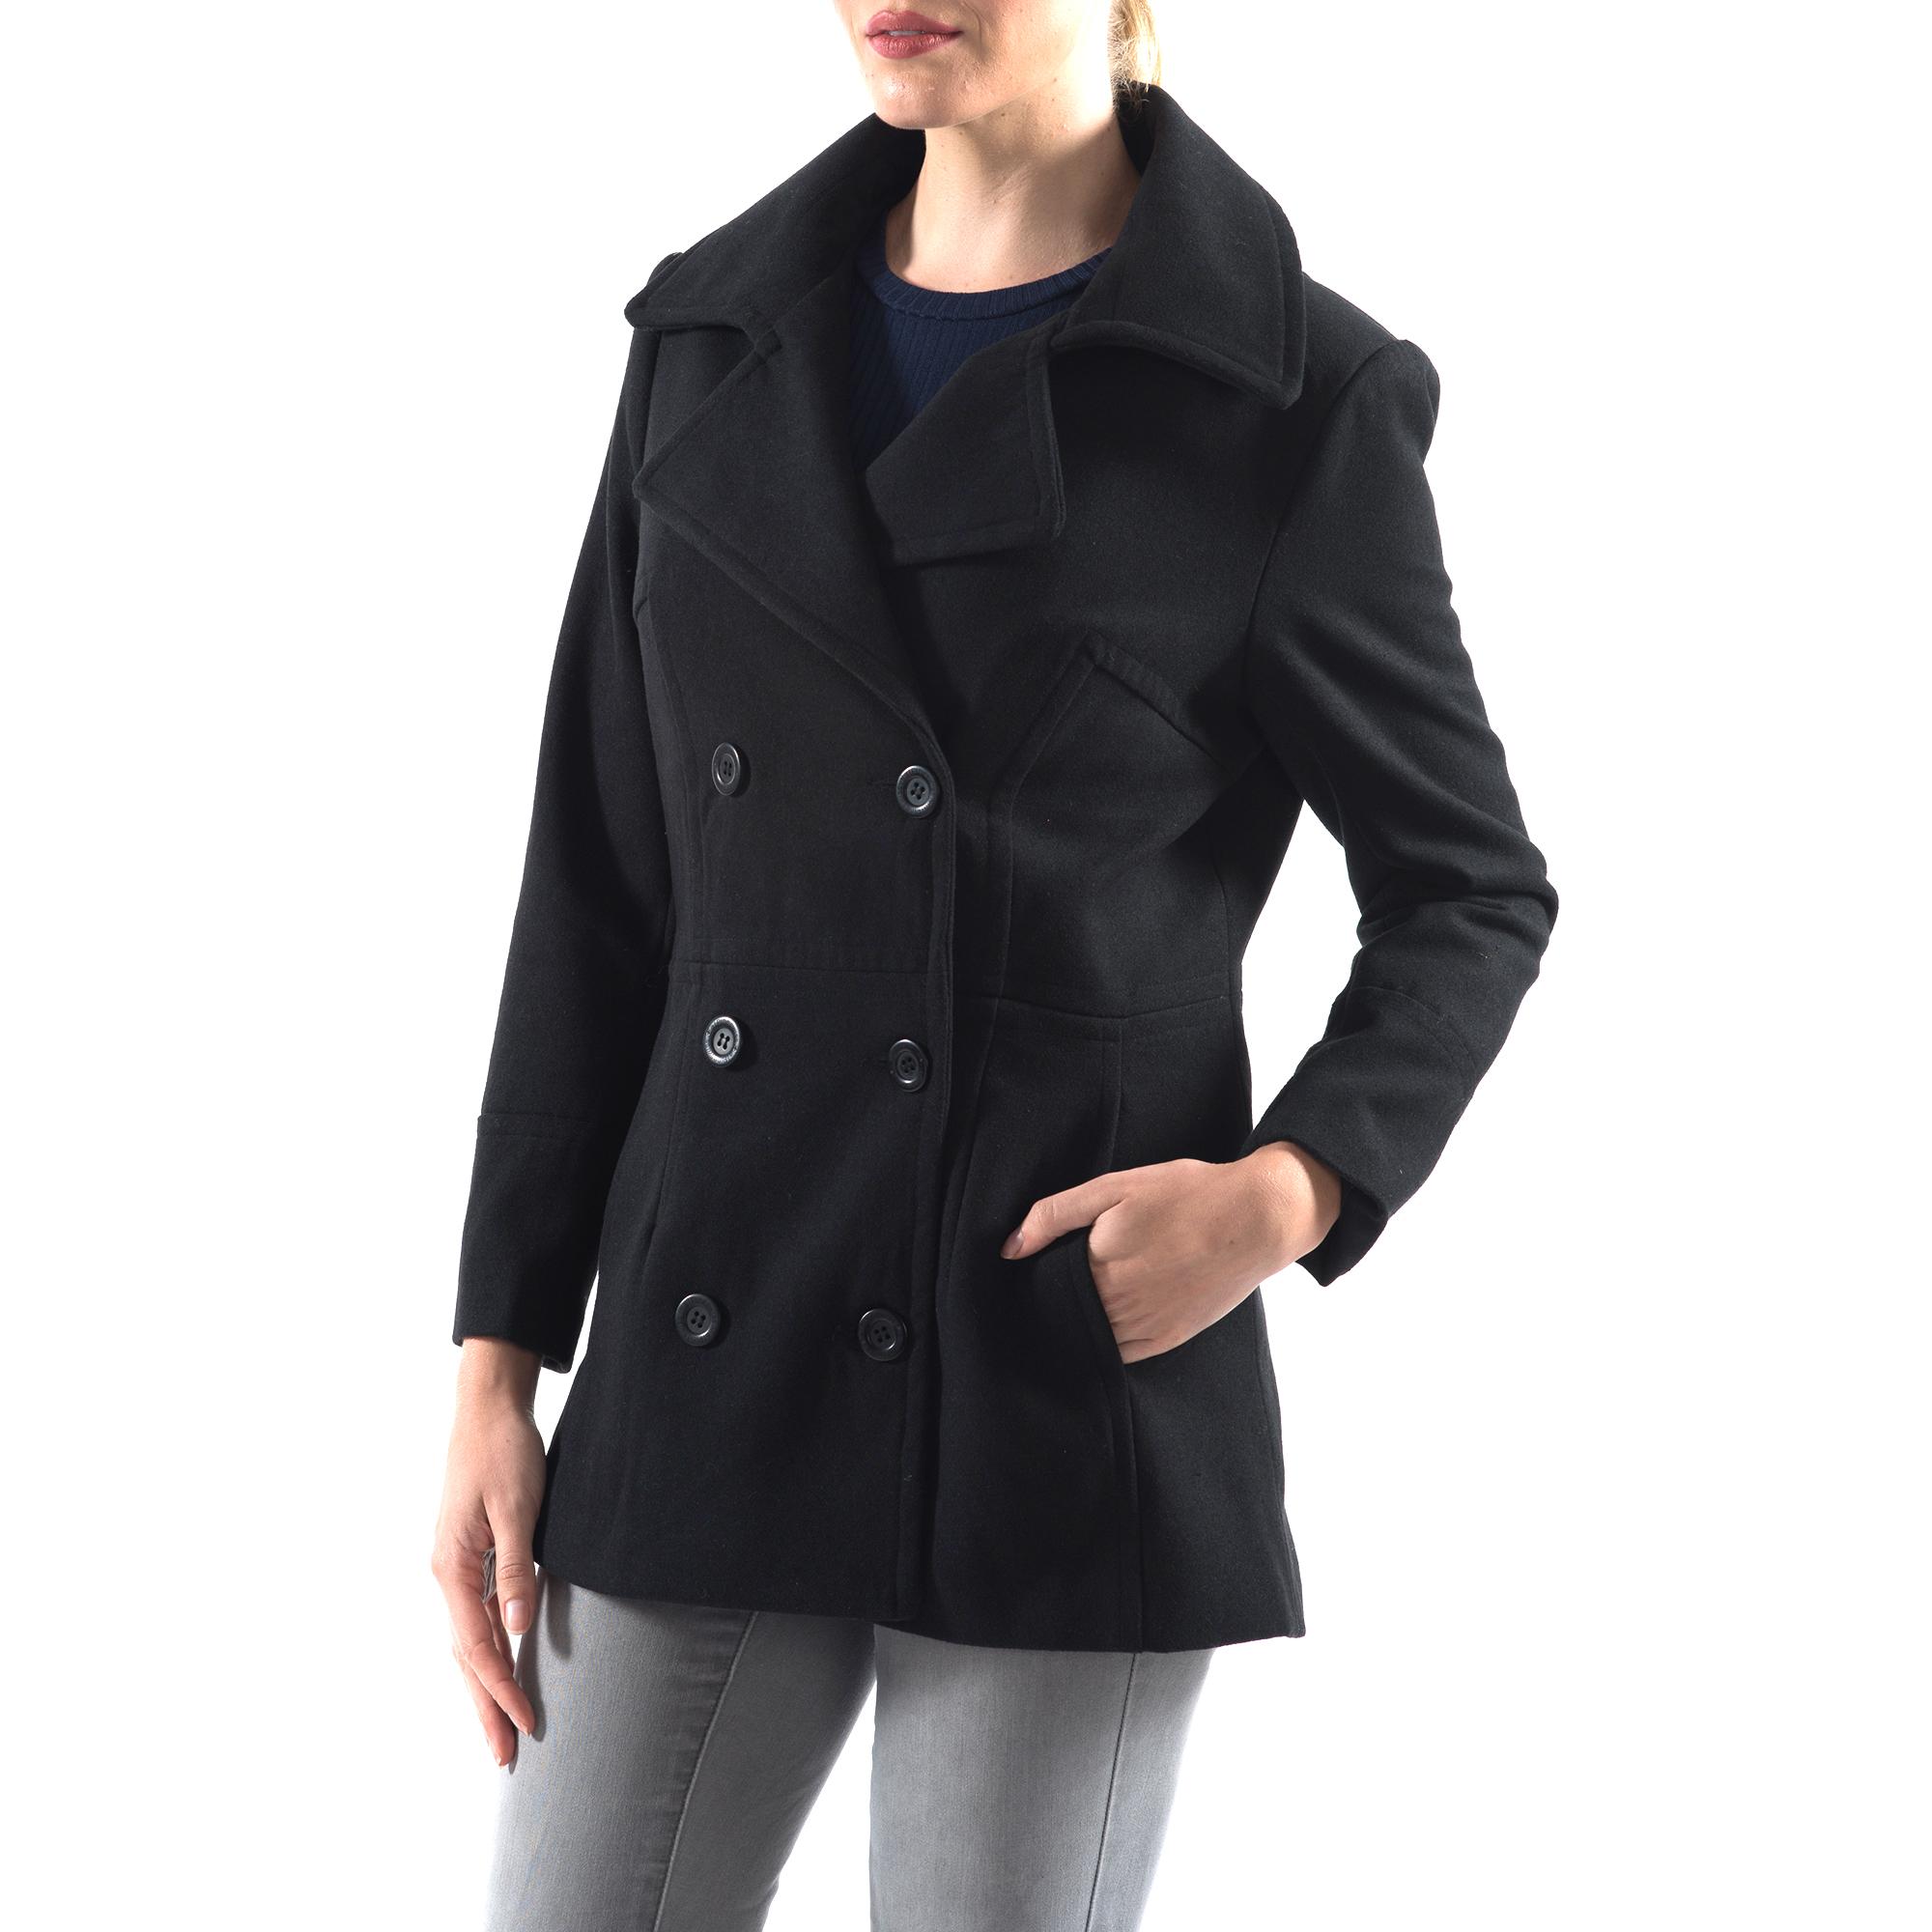 Alpine-Swiss-Emma-Womens-Peacoat-Jacket-Wool-Blazer-Double-Breasted-Overcoat-New thumbnail 16